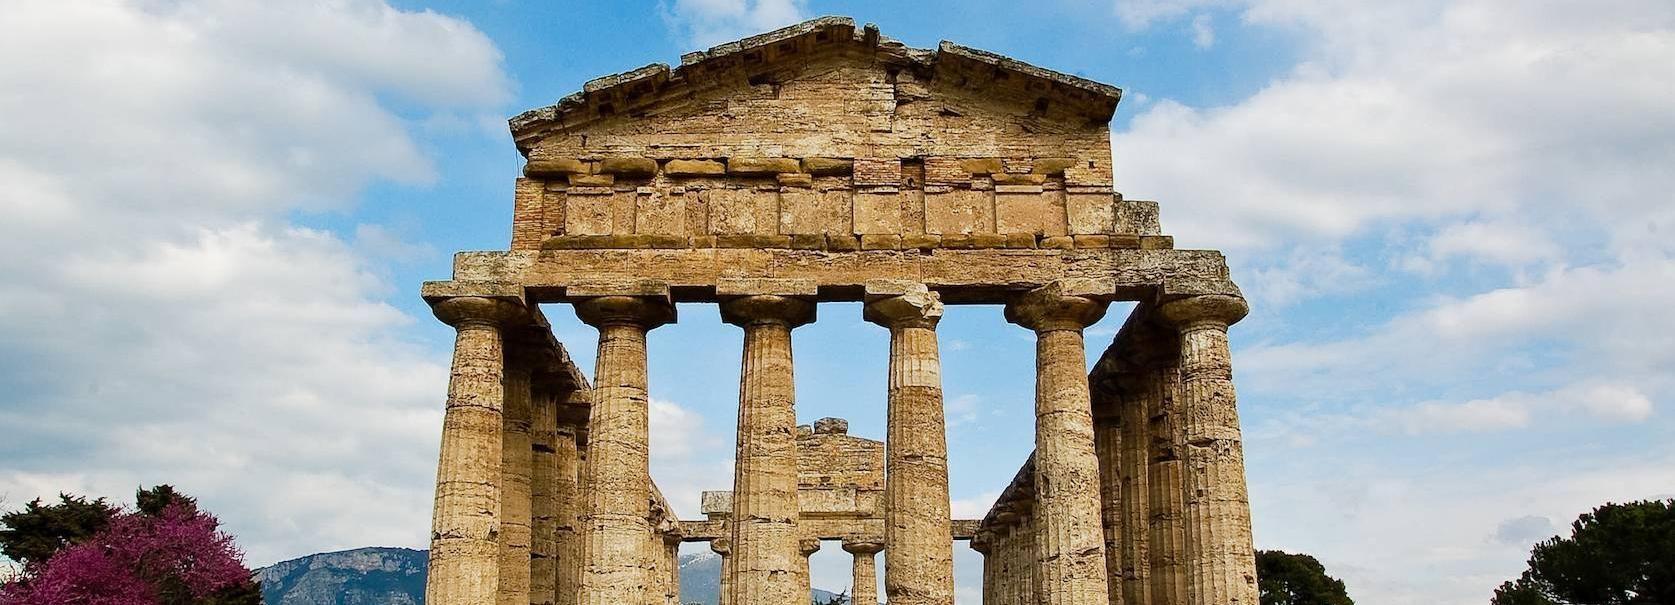 De Sorrente: visite de la ferme de Paestum et Buffalo